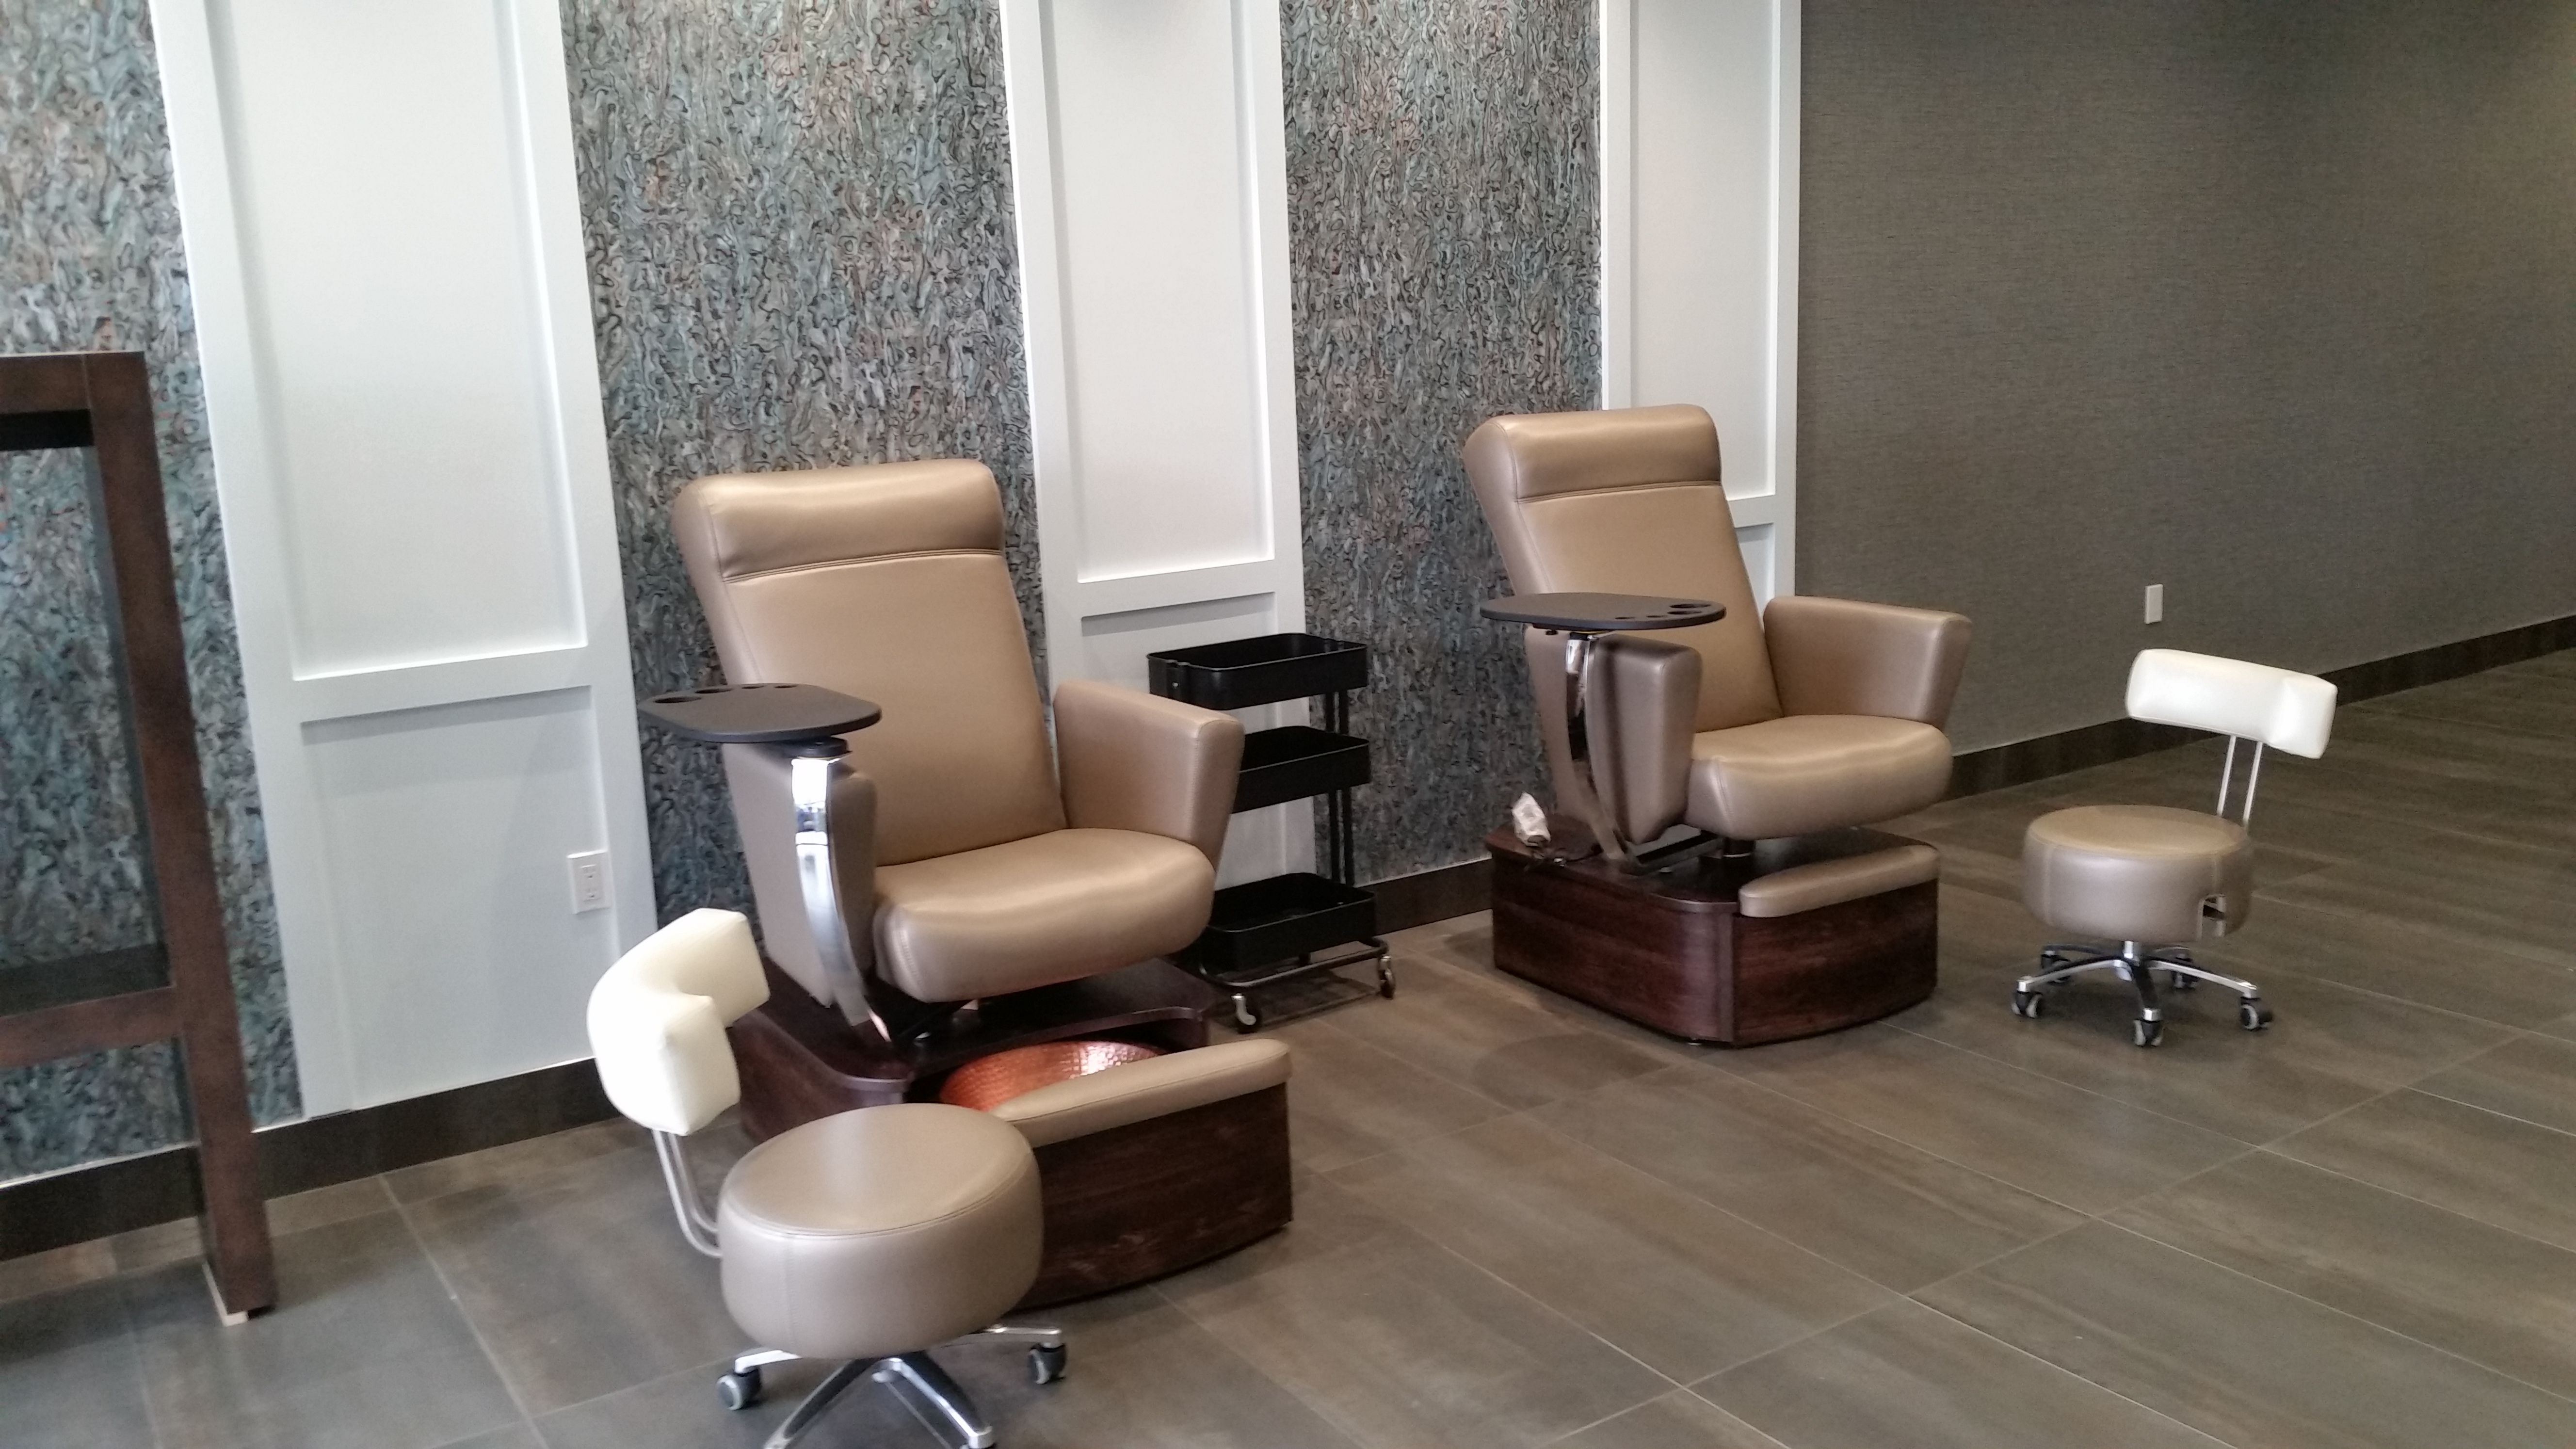 Pedicure Chair Element No Plumbing Salon Chairs For Sale Salon Furniture Pedicure Tub